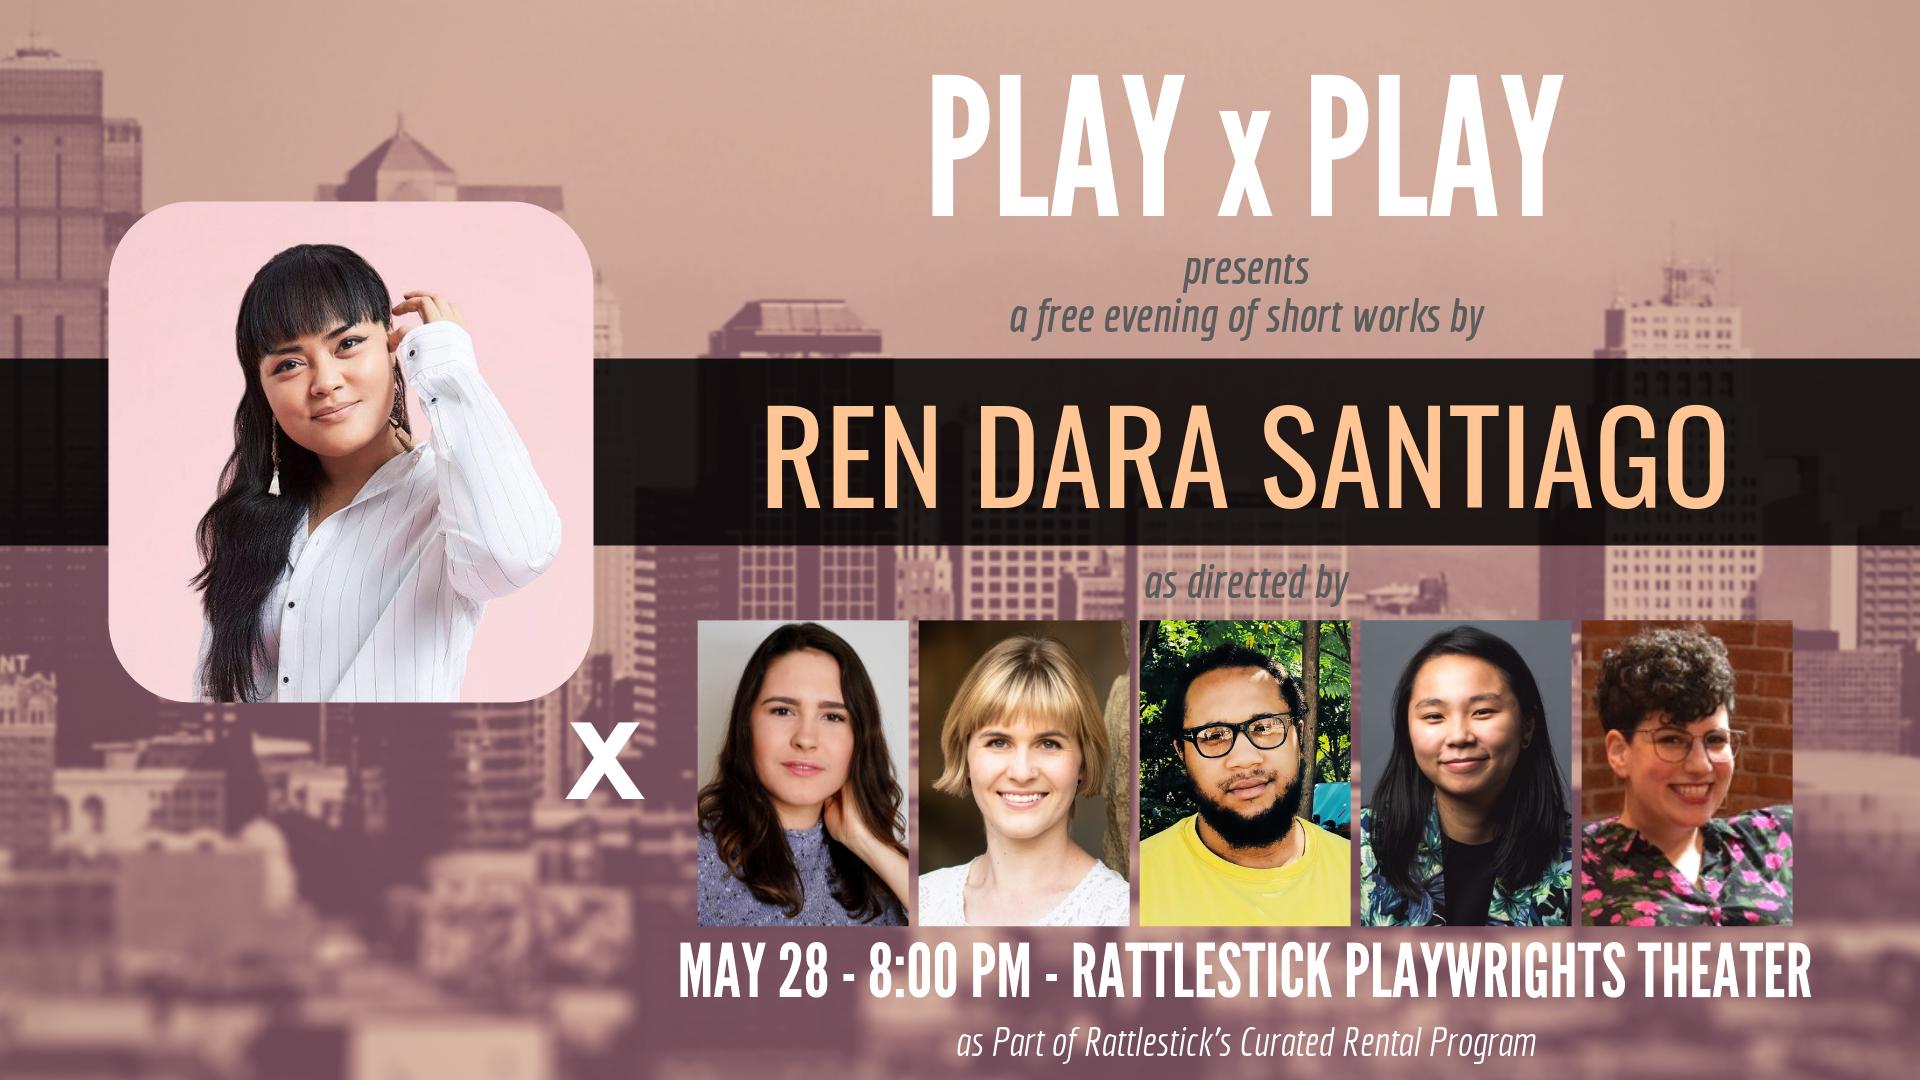 PLAYxPLAY: Ren Dara Santiago - May 28